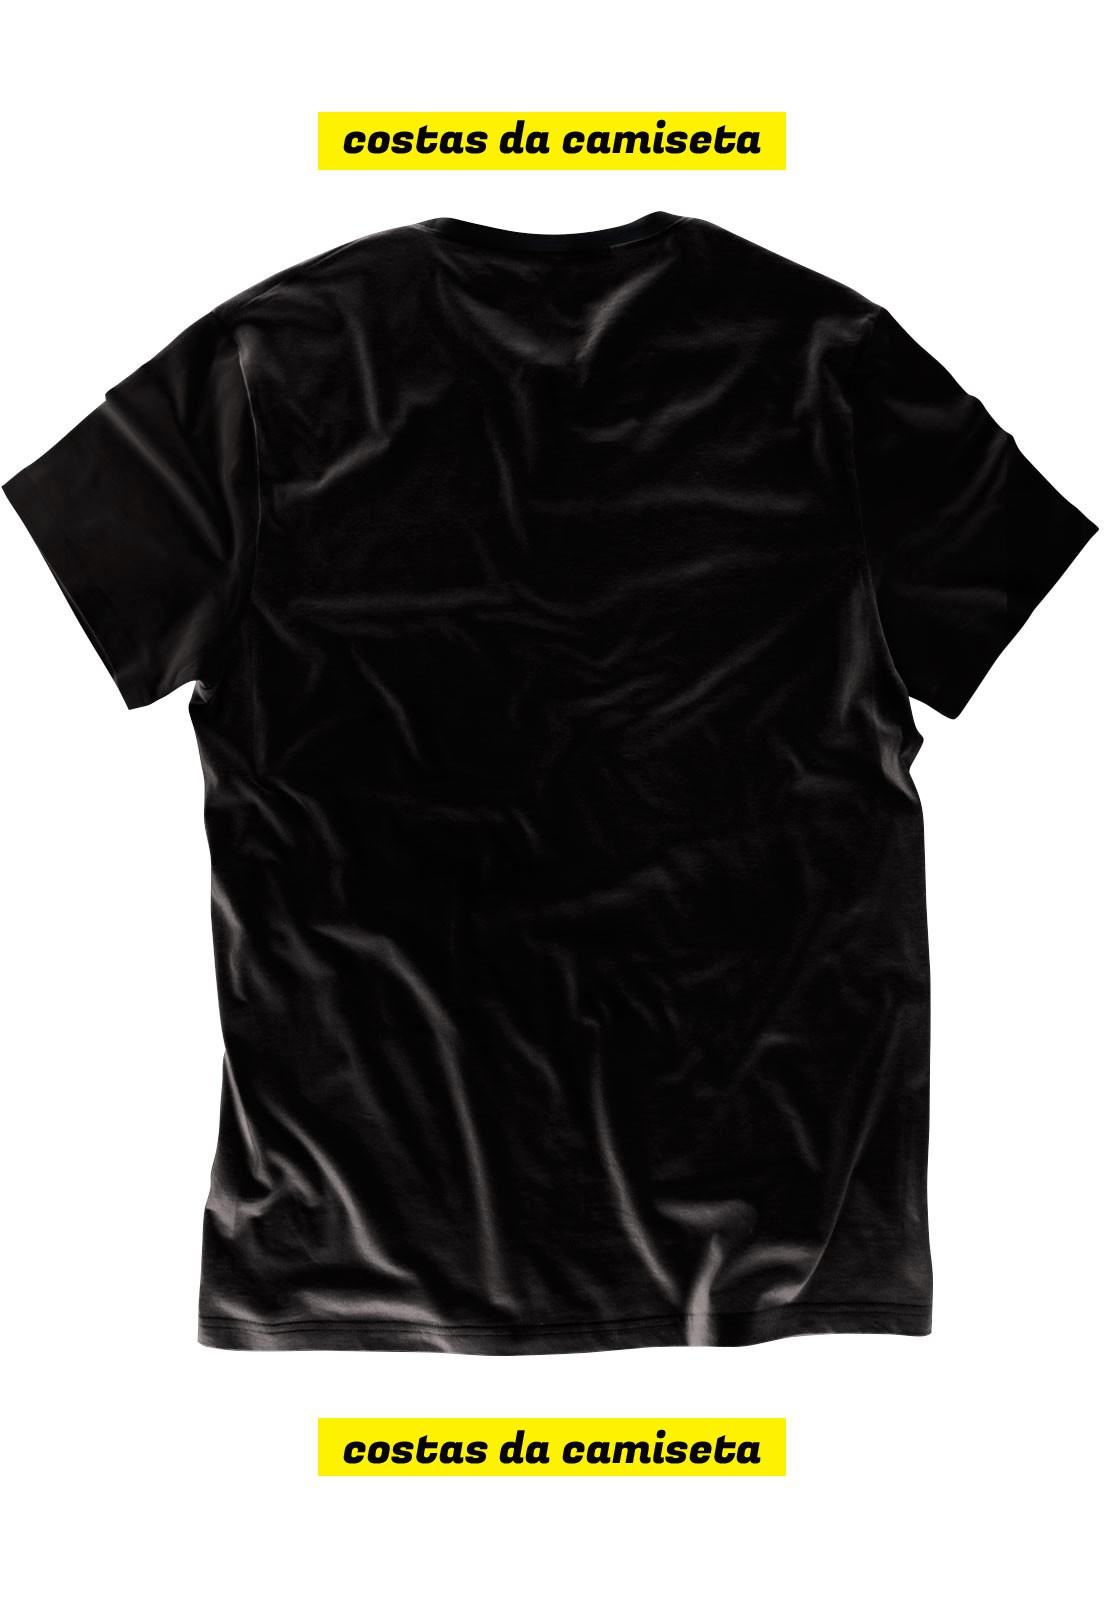 Camiseta Tie Dye Colorido Tye Die Cores Pasteis Exclusiva